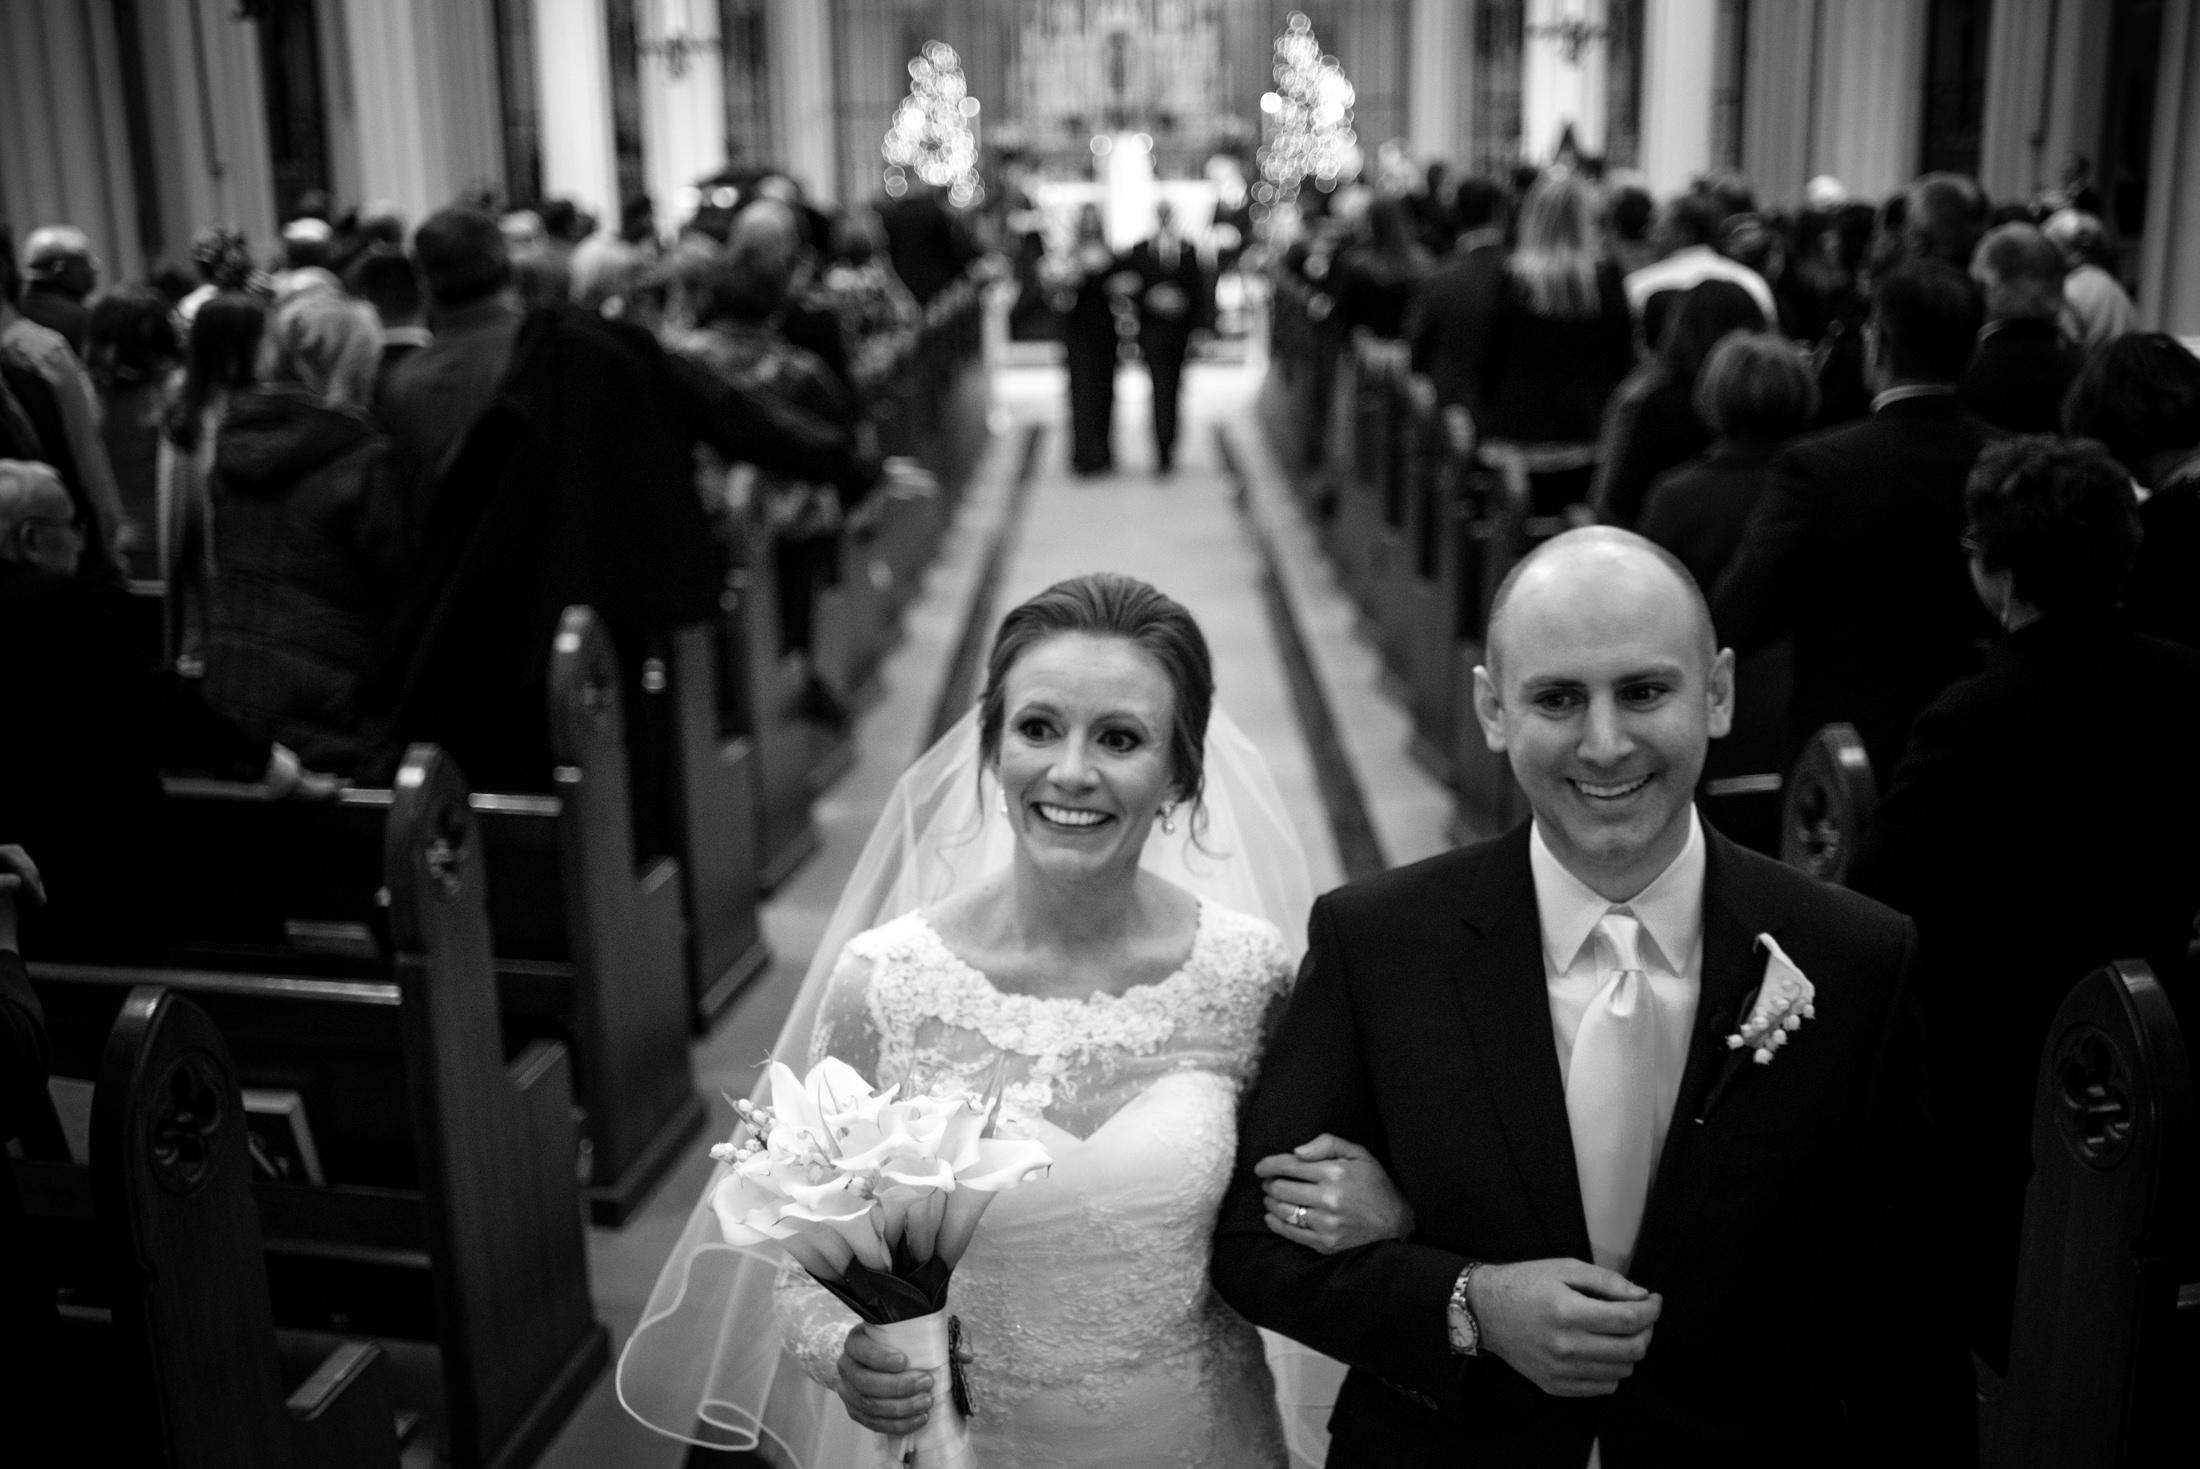 st-johns-creighton-omaha-wedding-photographer-jm-studios-0014.JPG